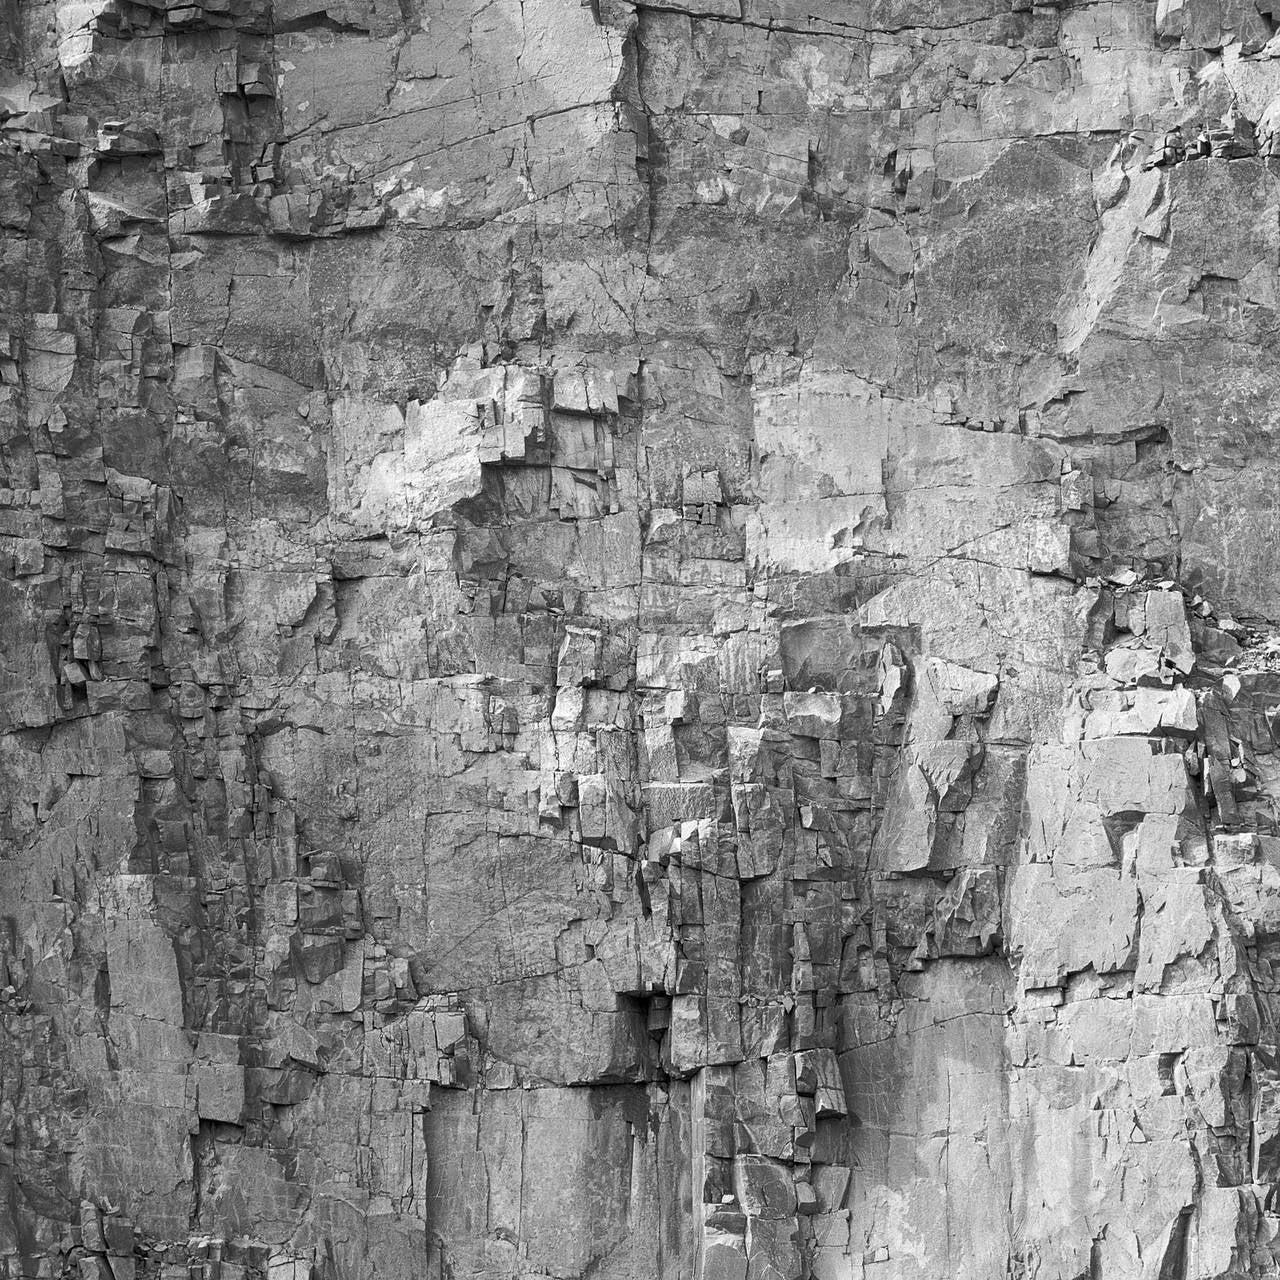 Andrew buck rockface 30 large square black white photograph